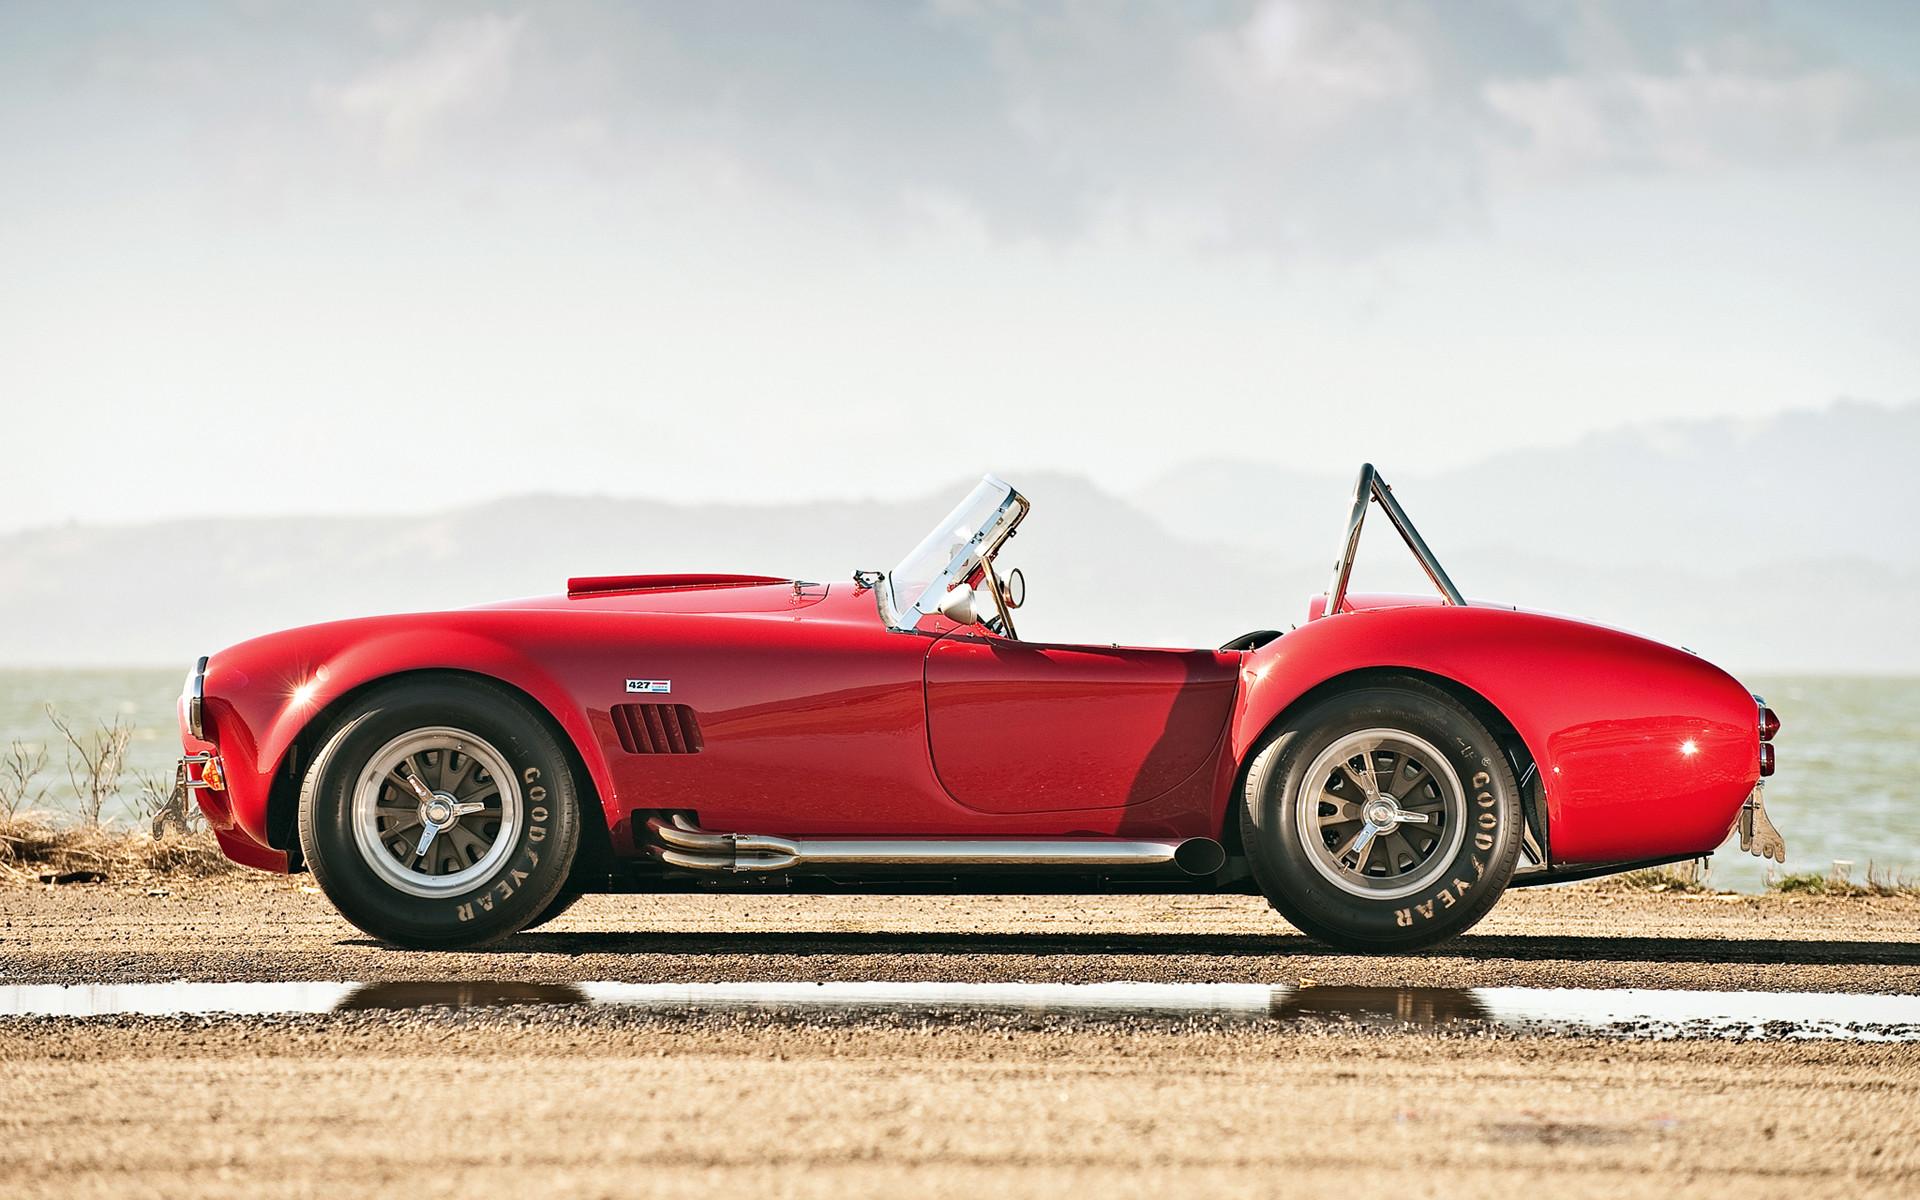 Red Shelby Cobra Wallpaper